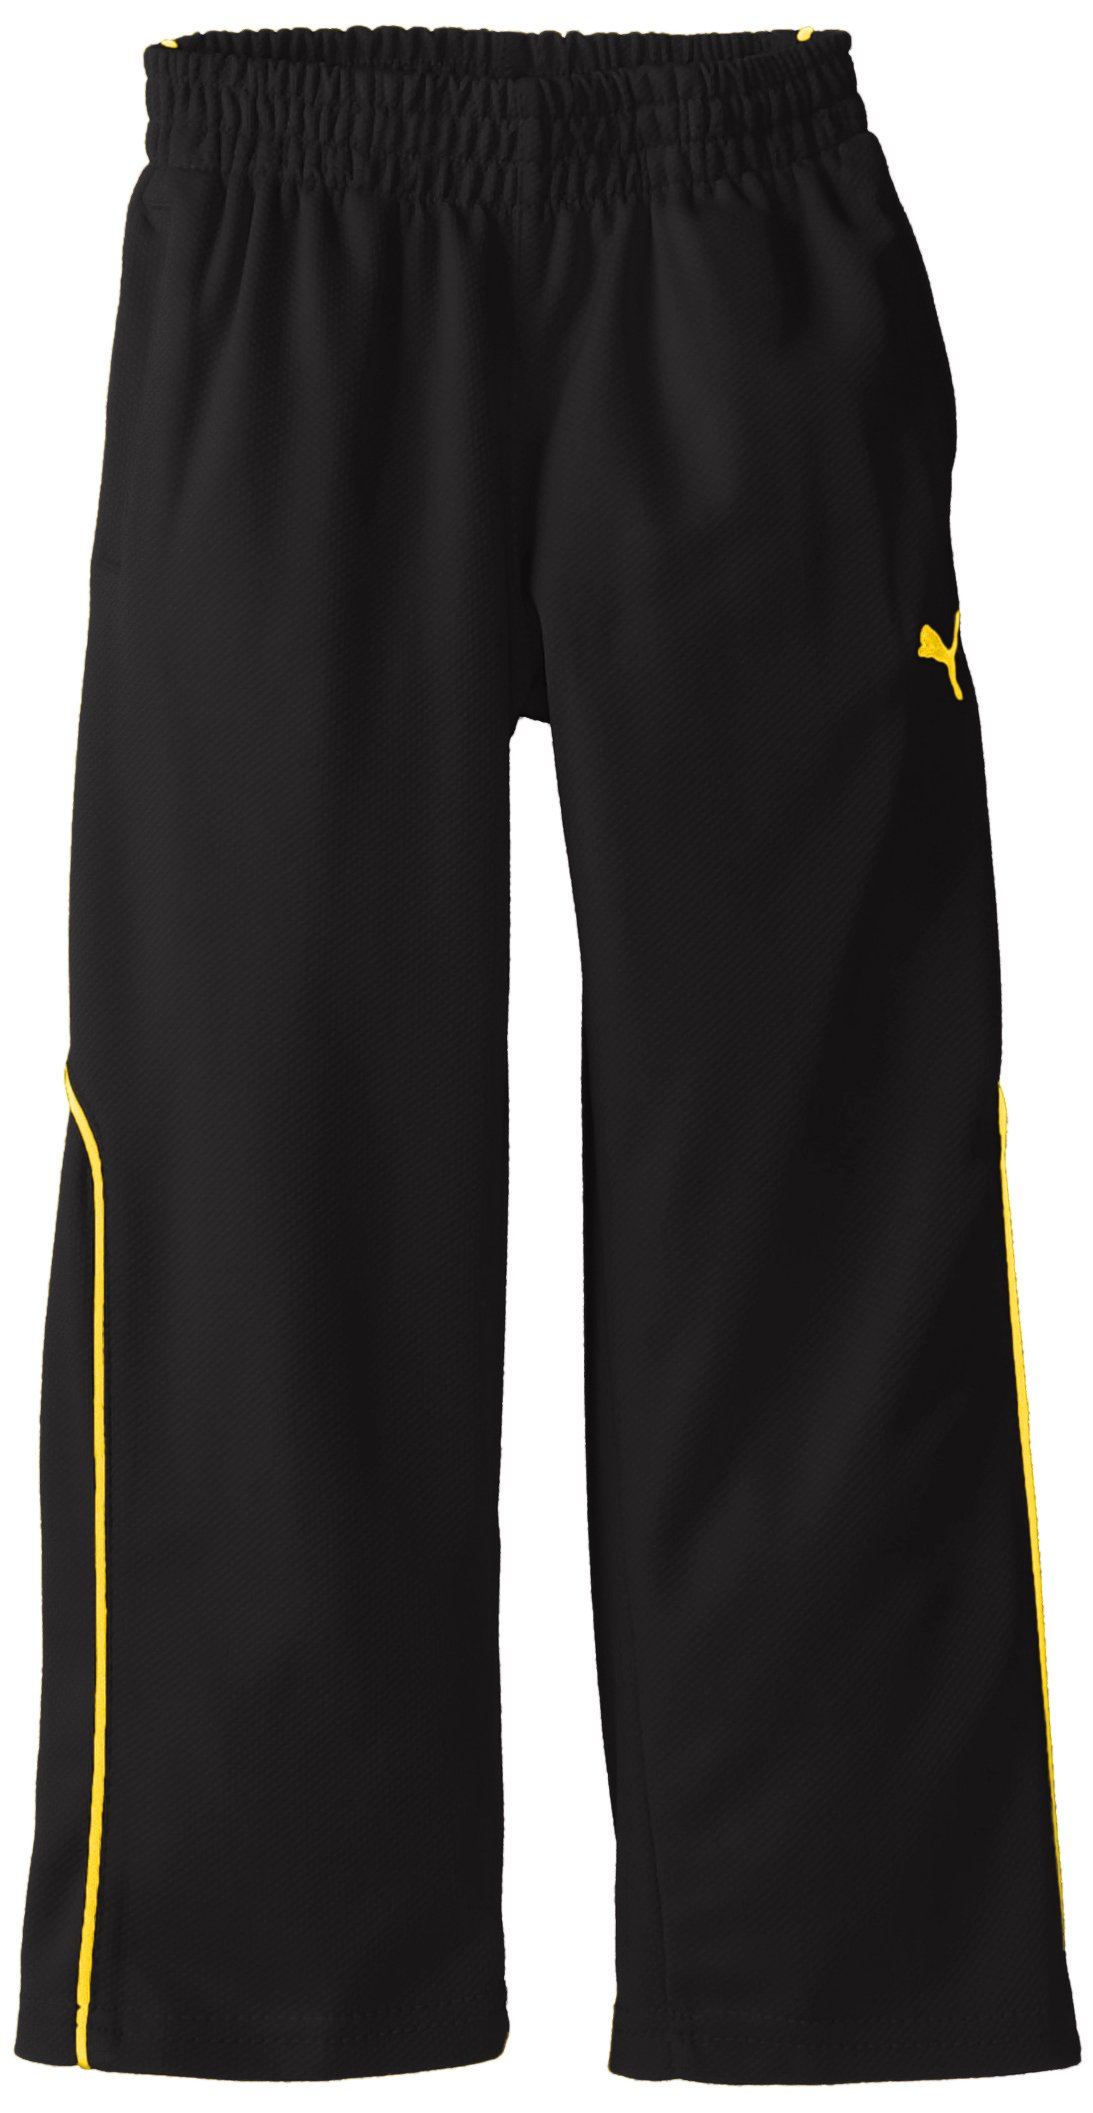 PUMA Little Boys' Training Pant 1, Black, 5